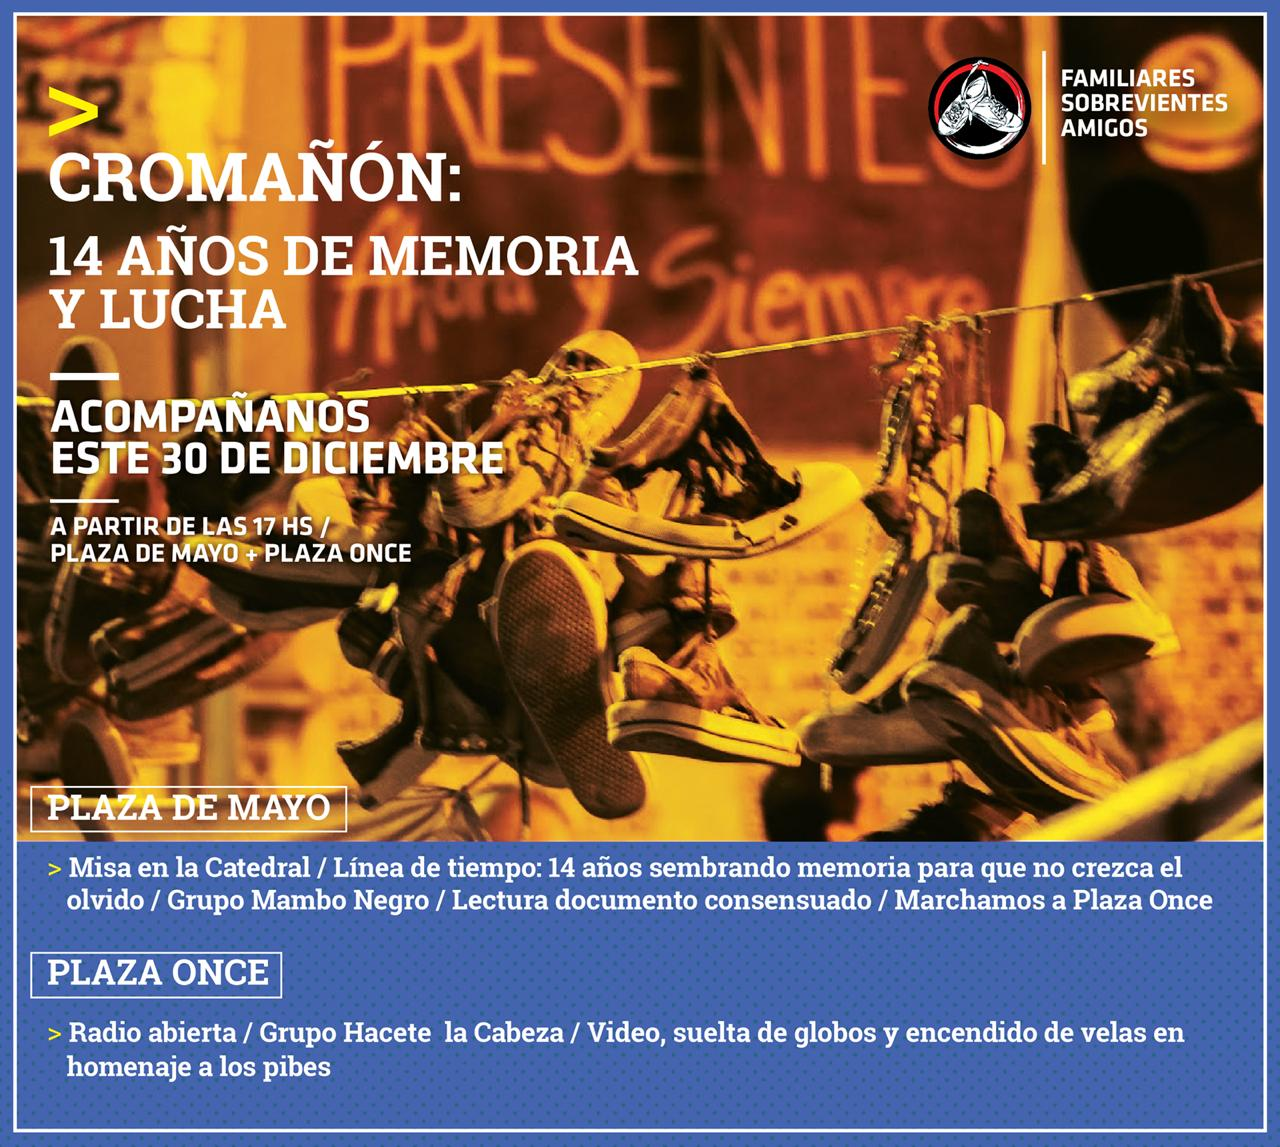 Convocatoria por lxs Pibes de Cromañón- 30 de diciembre 17.30 hs - Plaza de Mayo